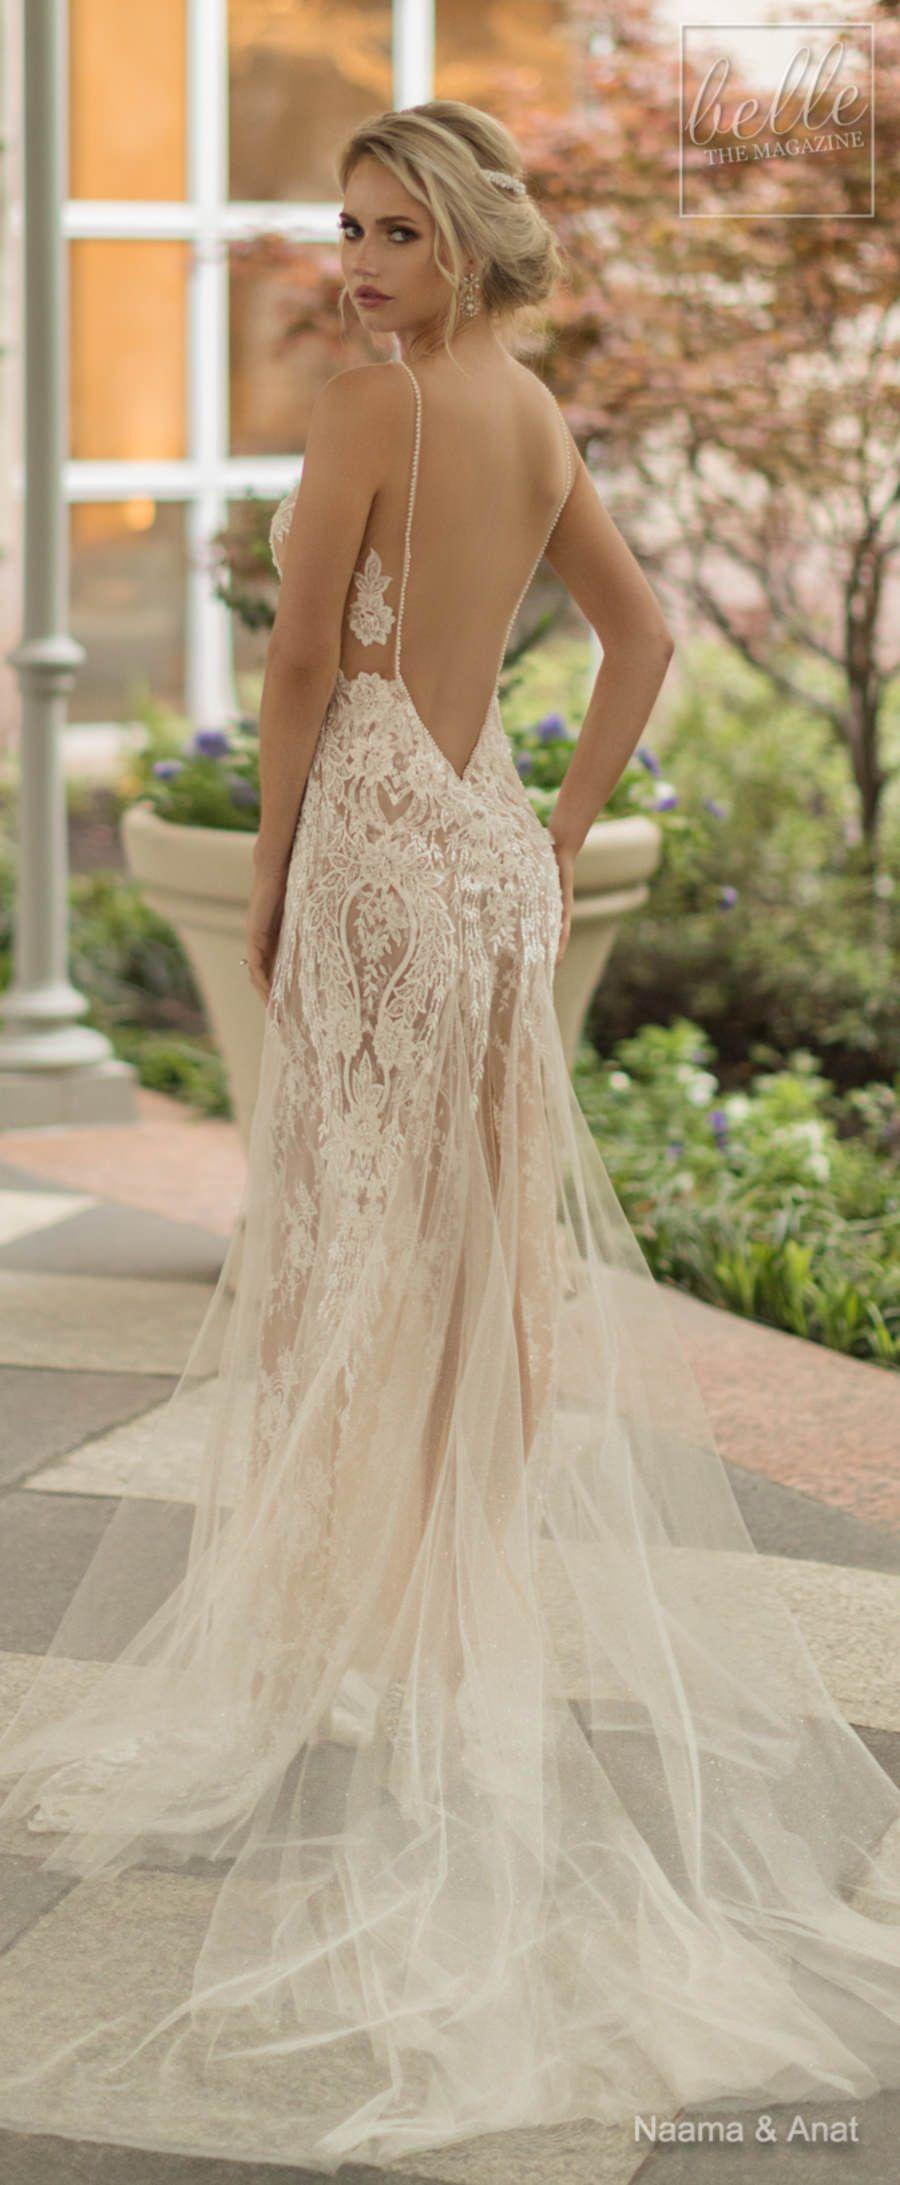 1e59ff1892 Naama and Anat Wedding Dress Collection 2019 - Dancing Up the Aisle - SALSA